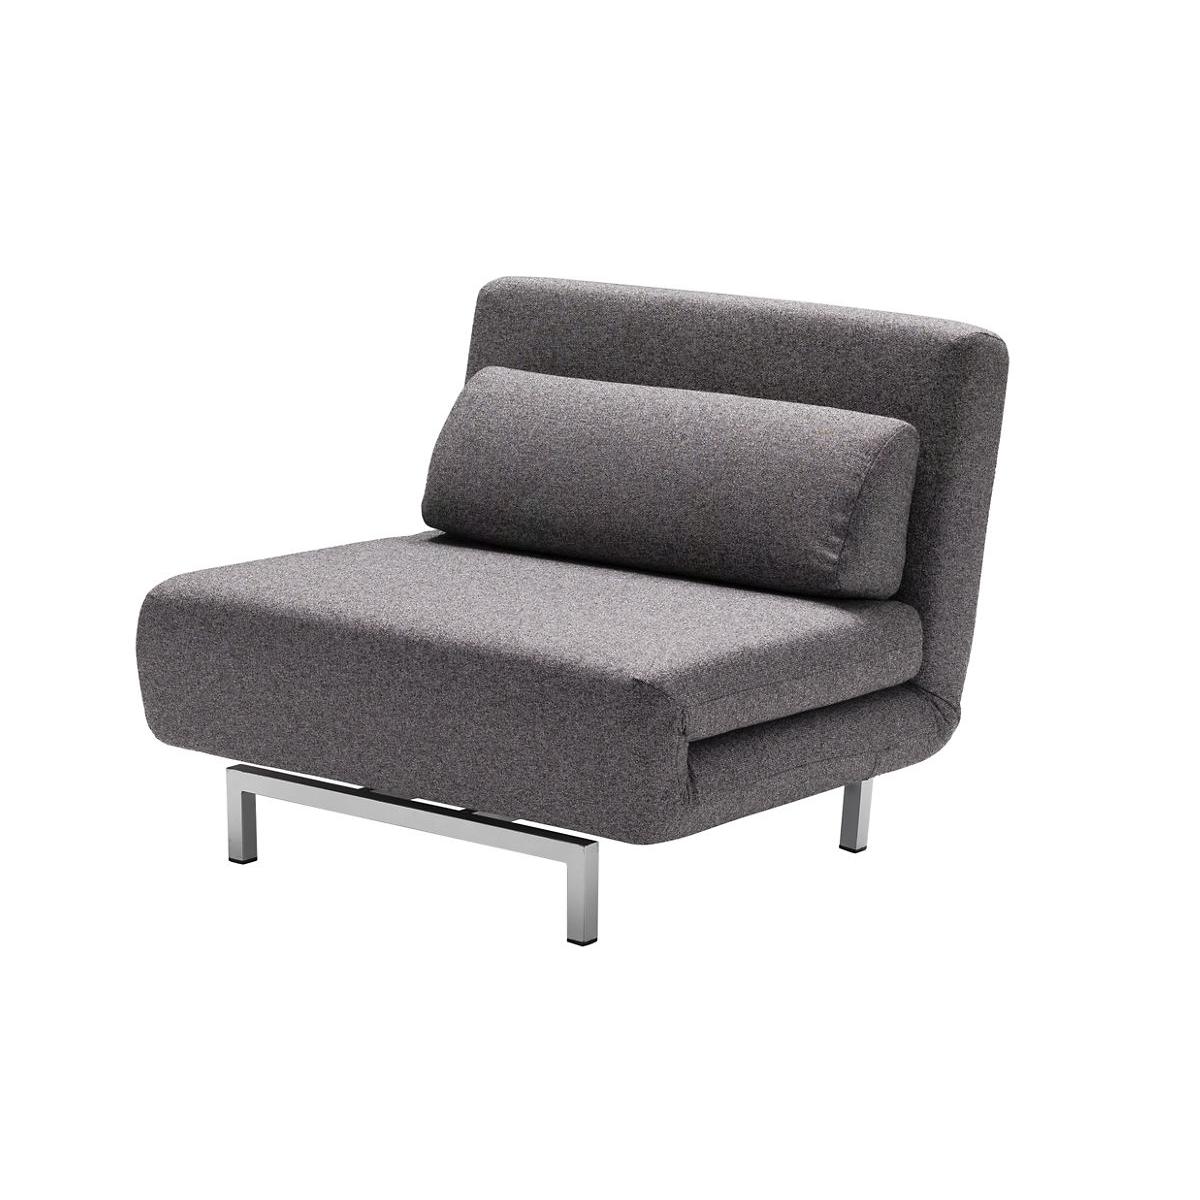 Mikaza Meubles Modernes Montreal: Sofa Lit Liquidation Montreal